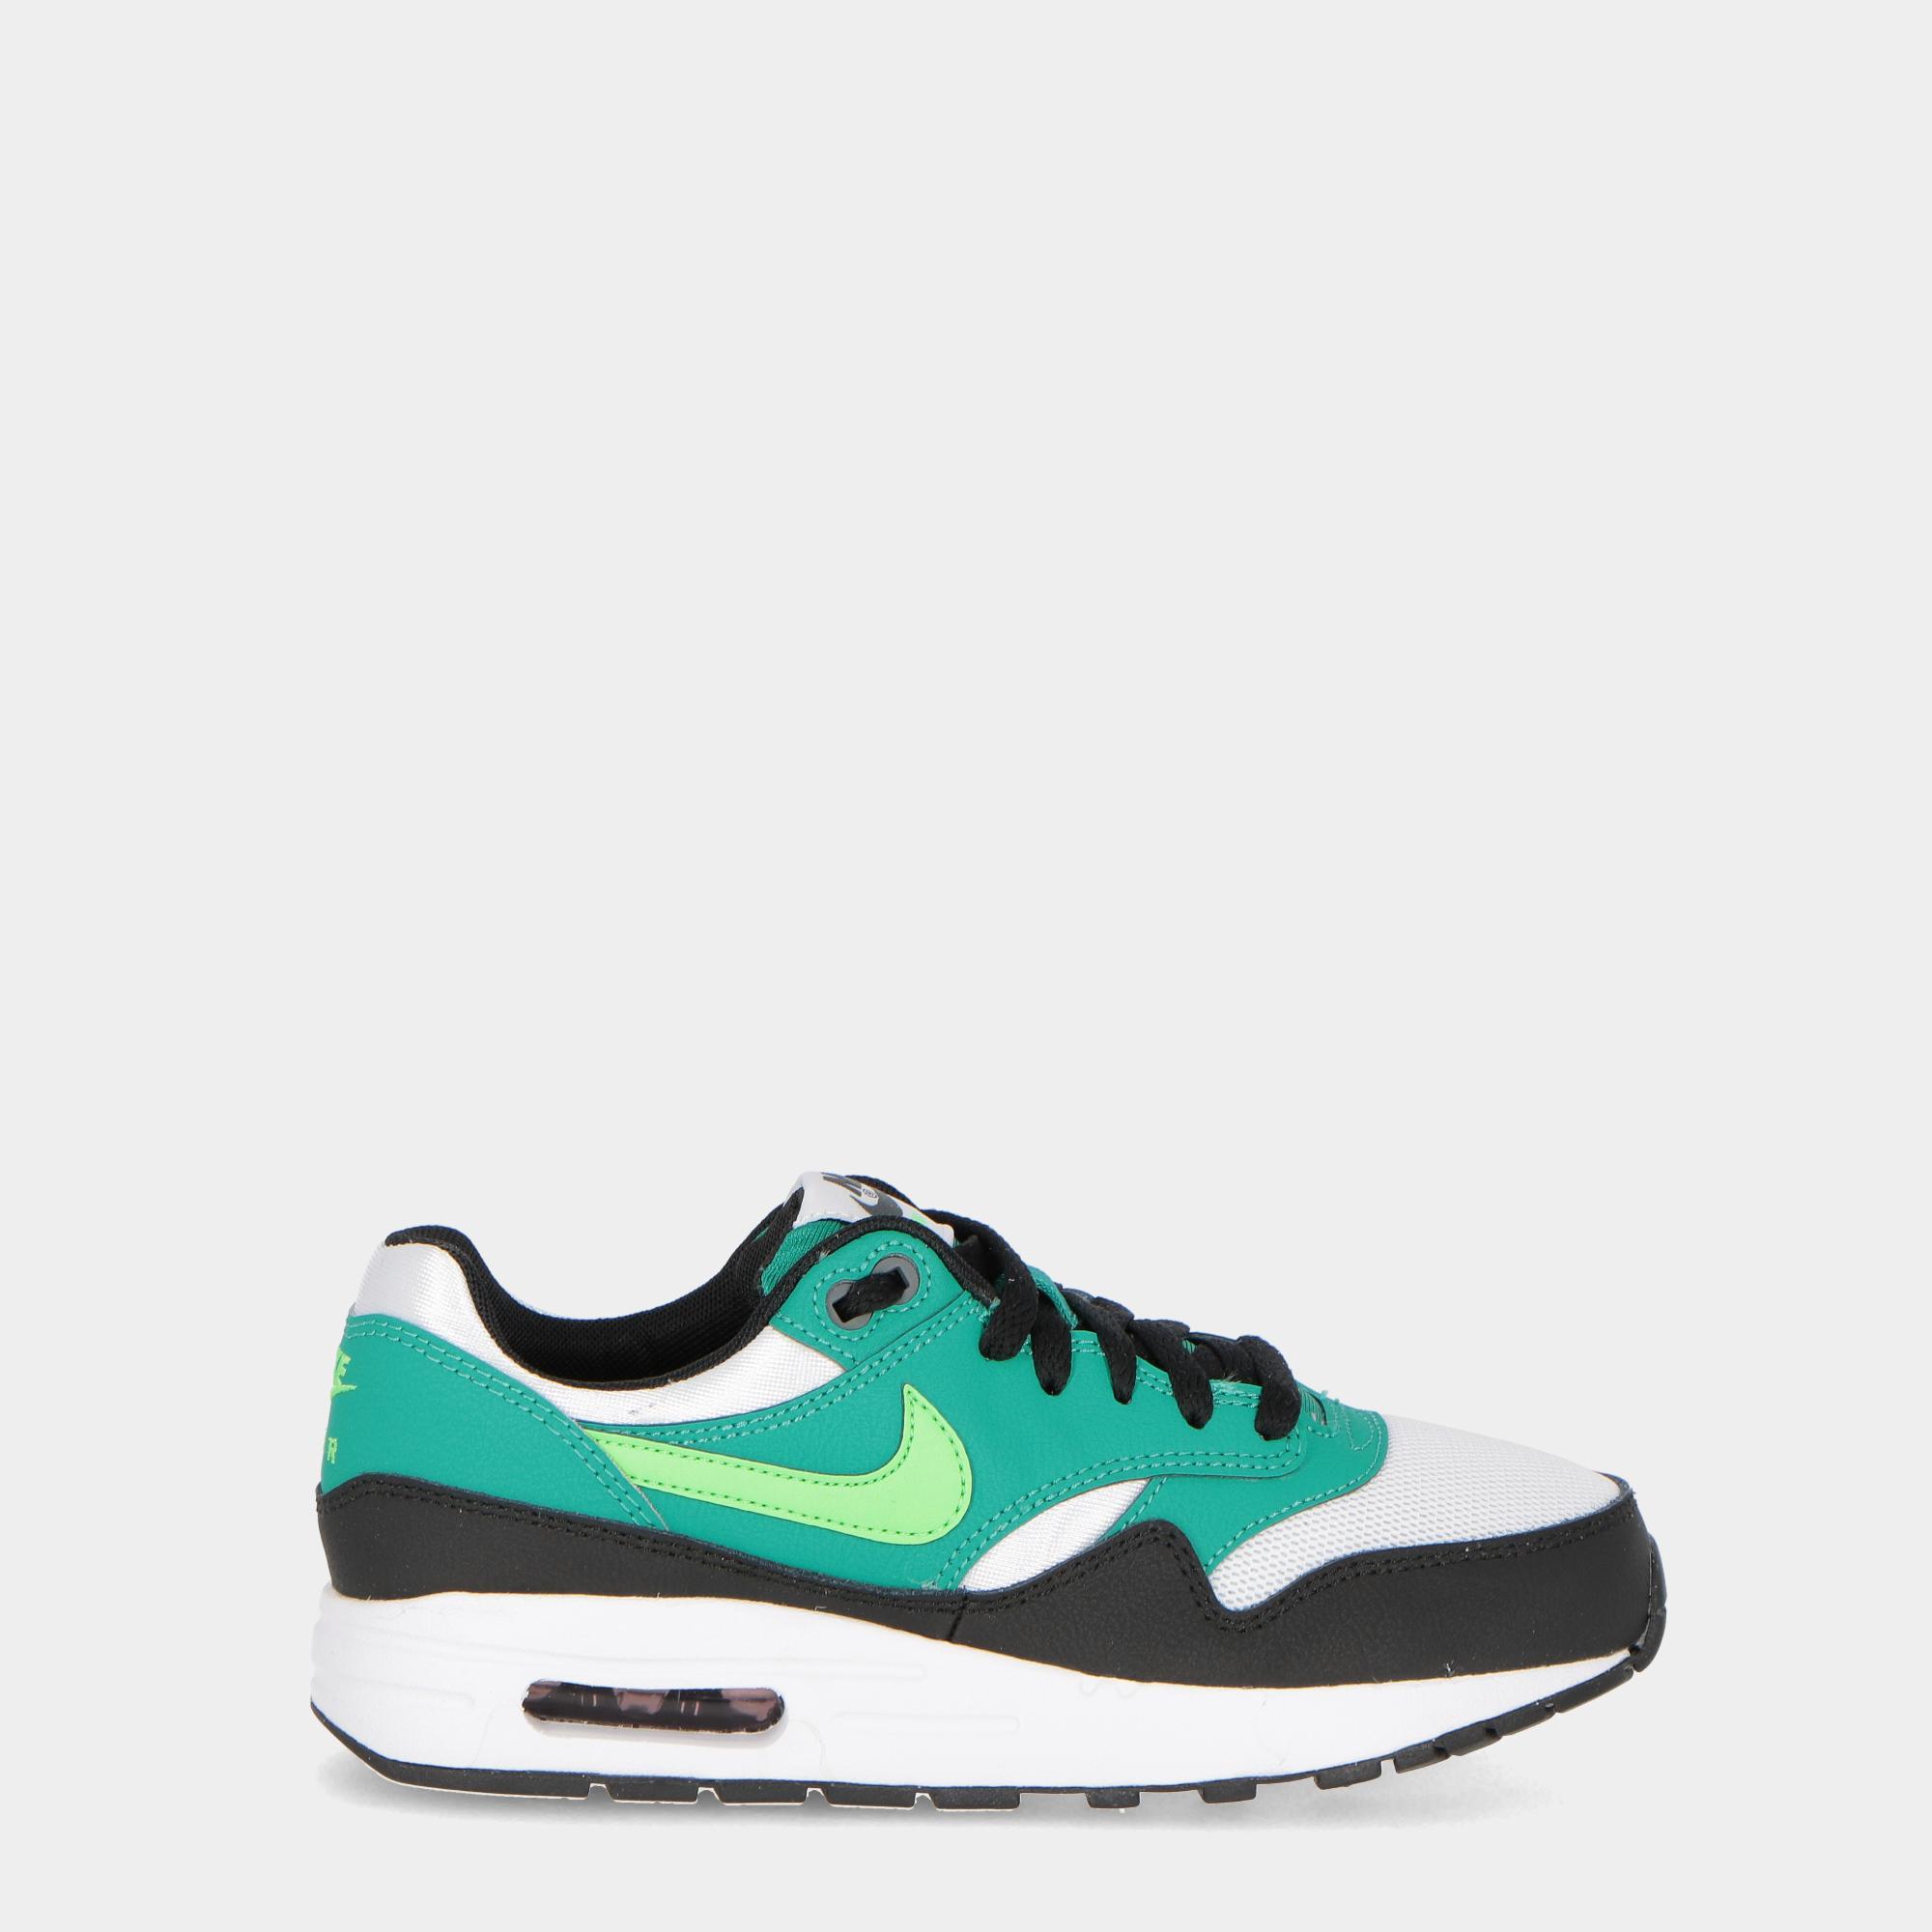 buy popular fb674 a2c1b Nike Air Max 1 (gs) - Kids Green white